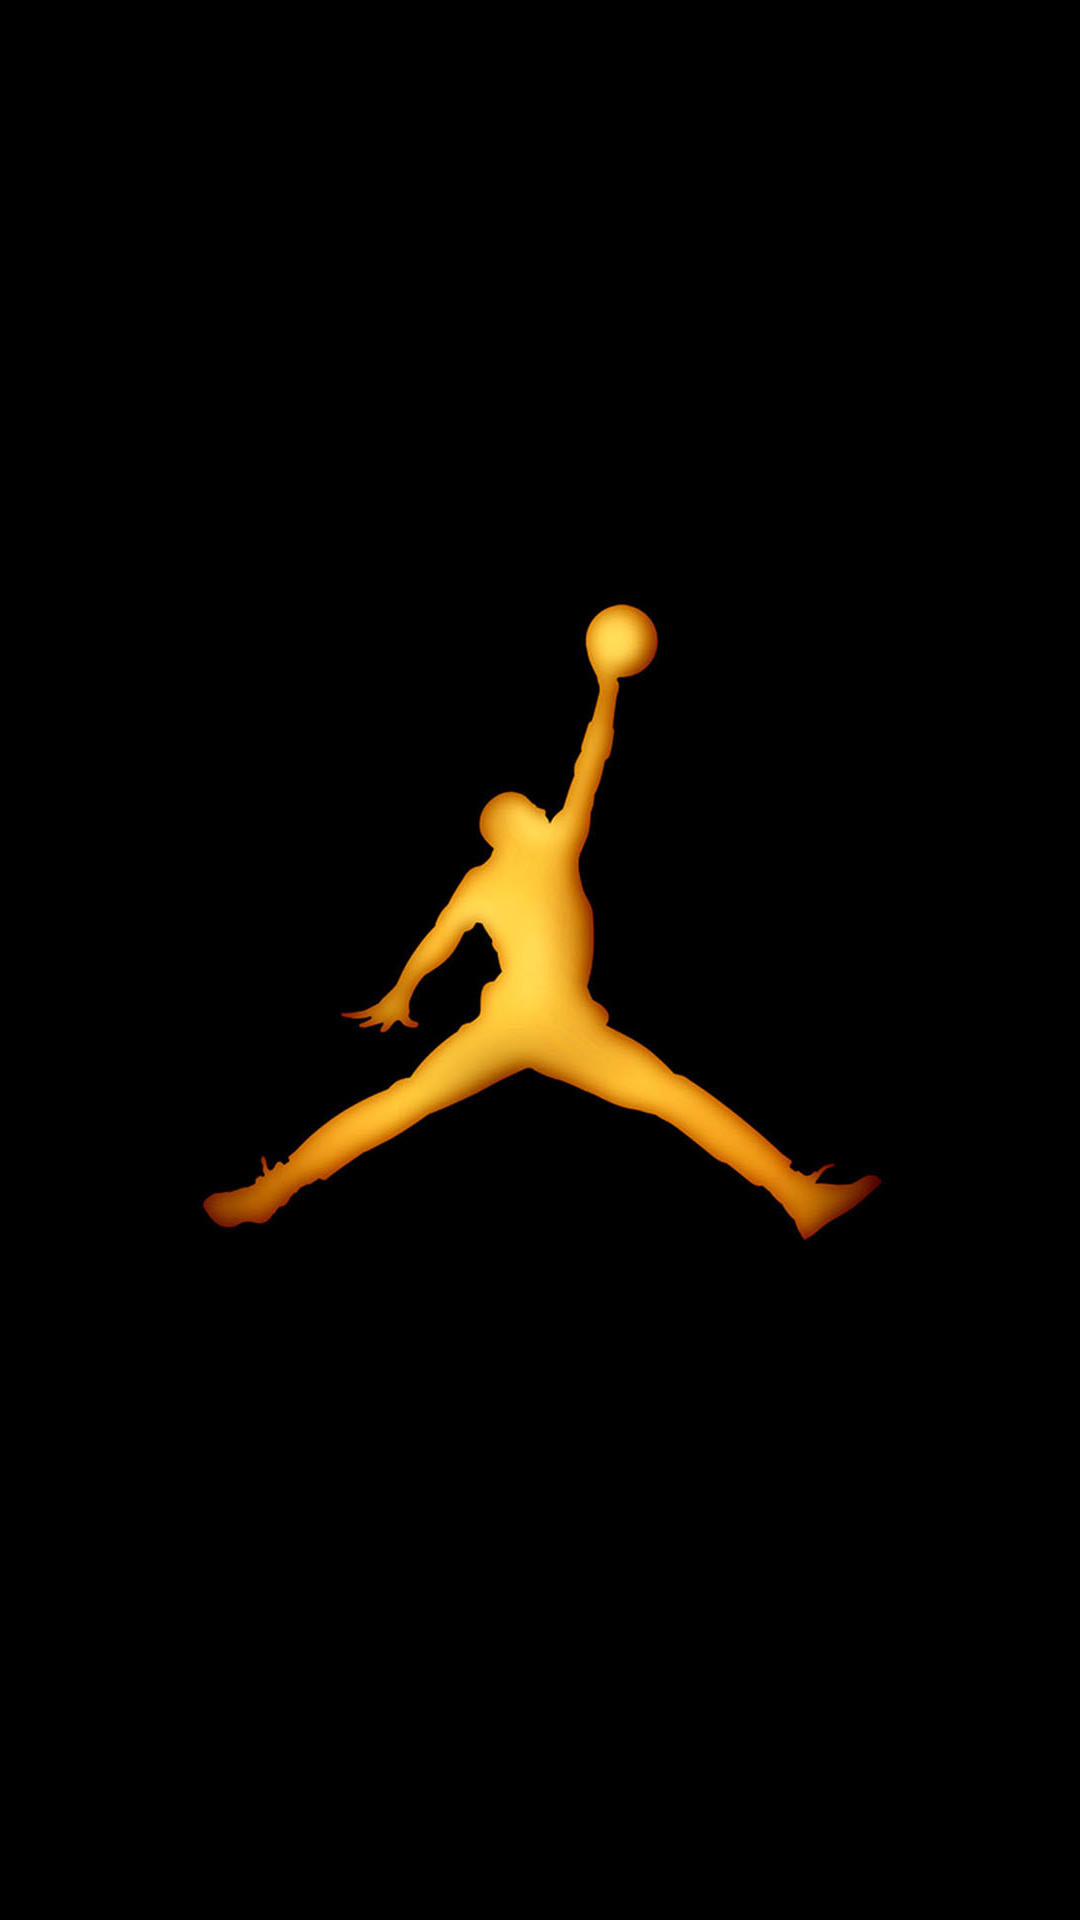 Basketball Sport Layup Outline IPhone 6 Wallpaper